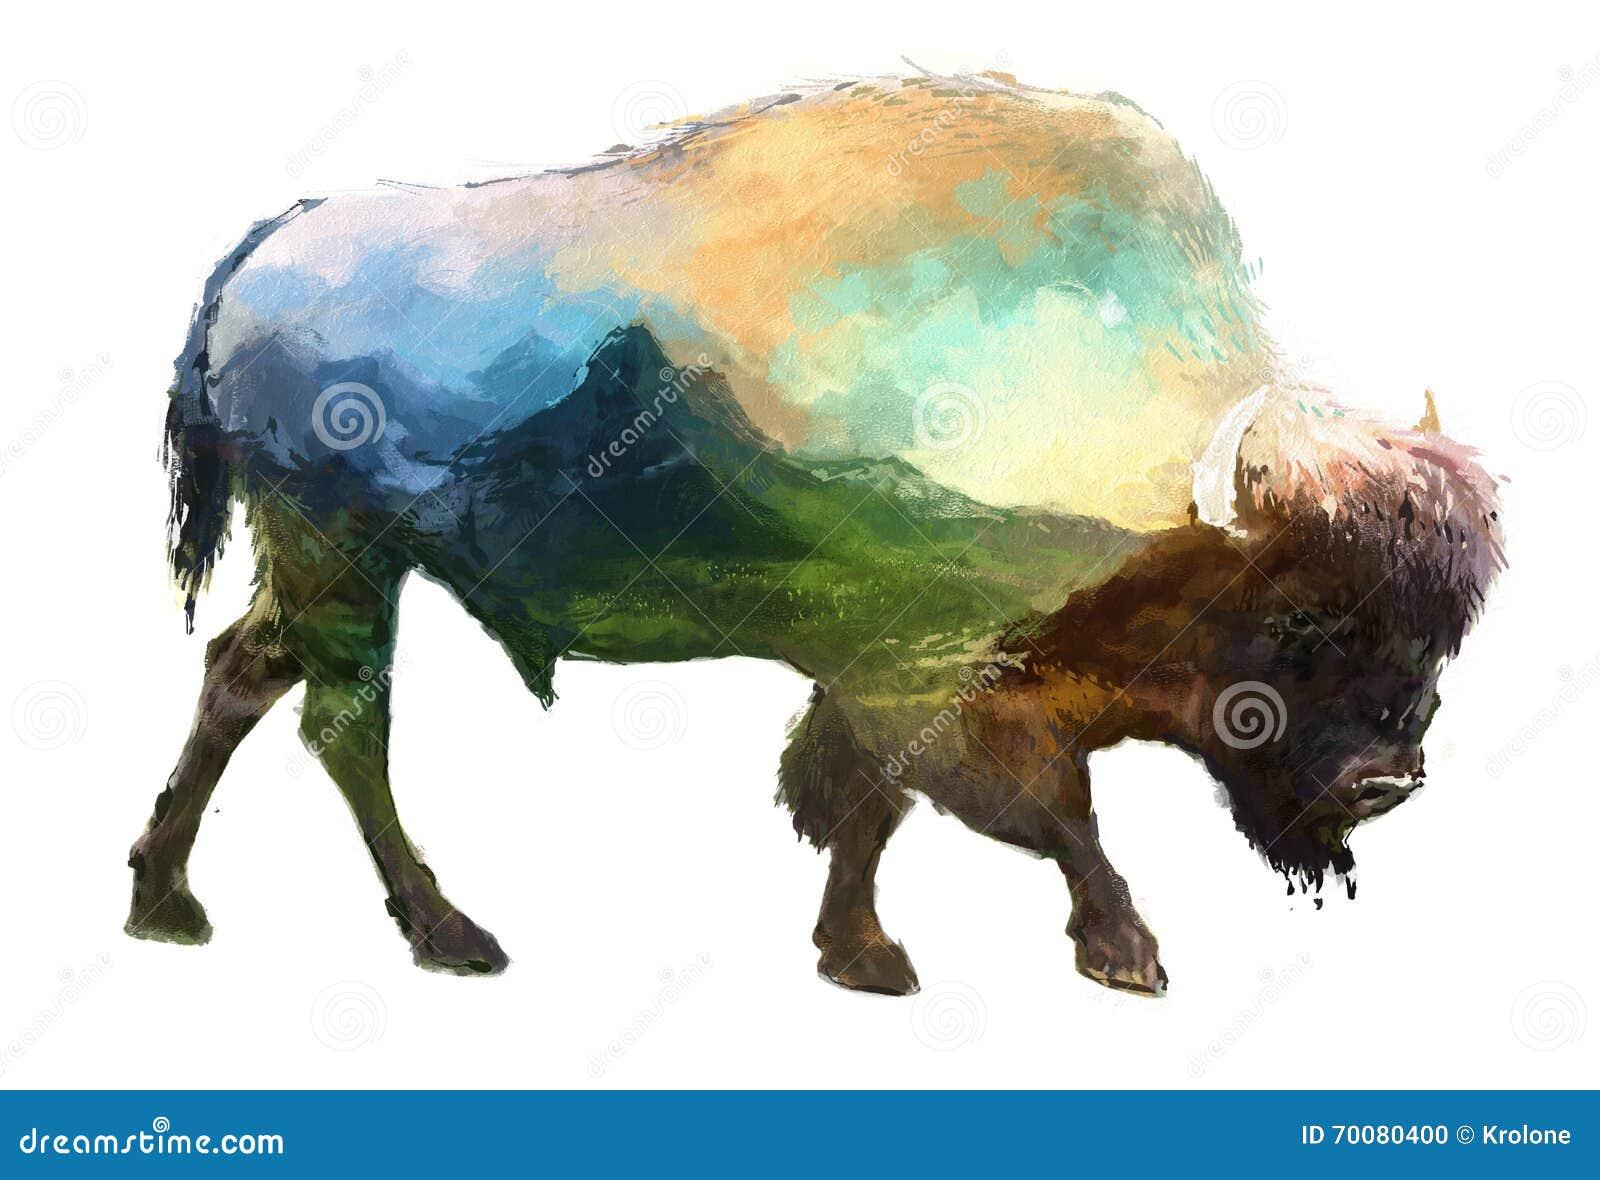 Bison double exposure illustration